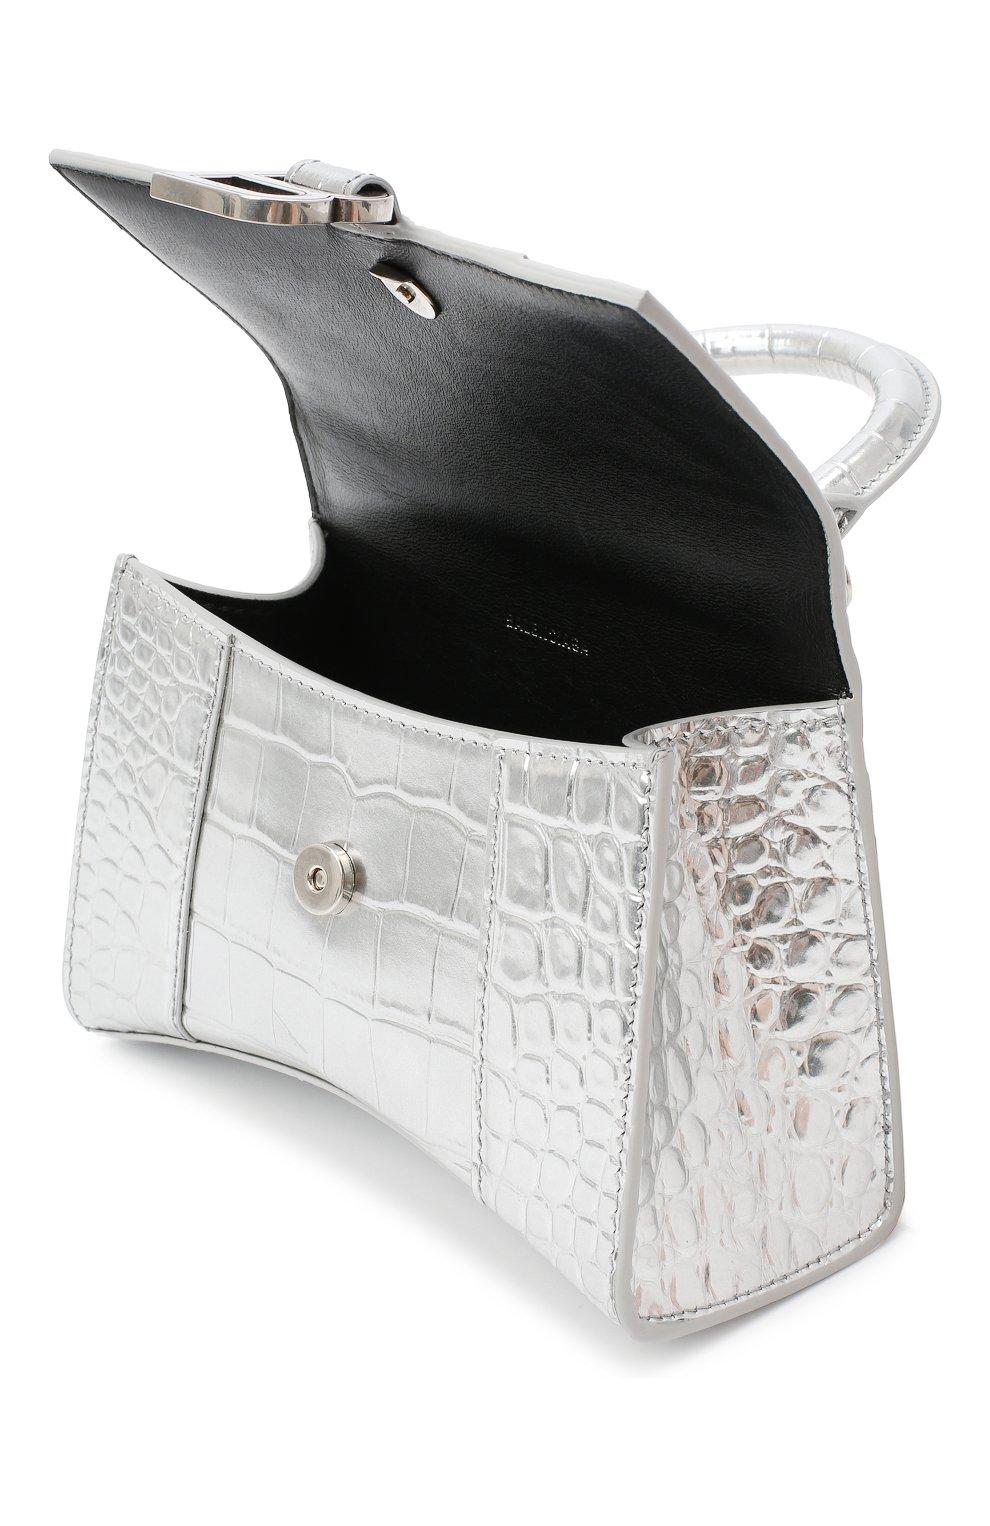 Женская сумка hourglass xs BALENCIAGA серебряного цвета, арт. 592833/1S49Y | Фото 4